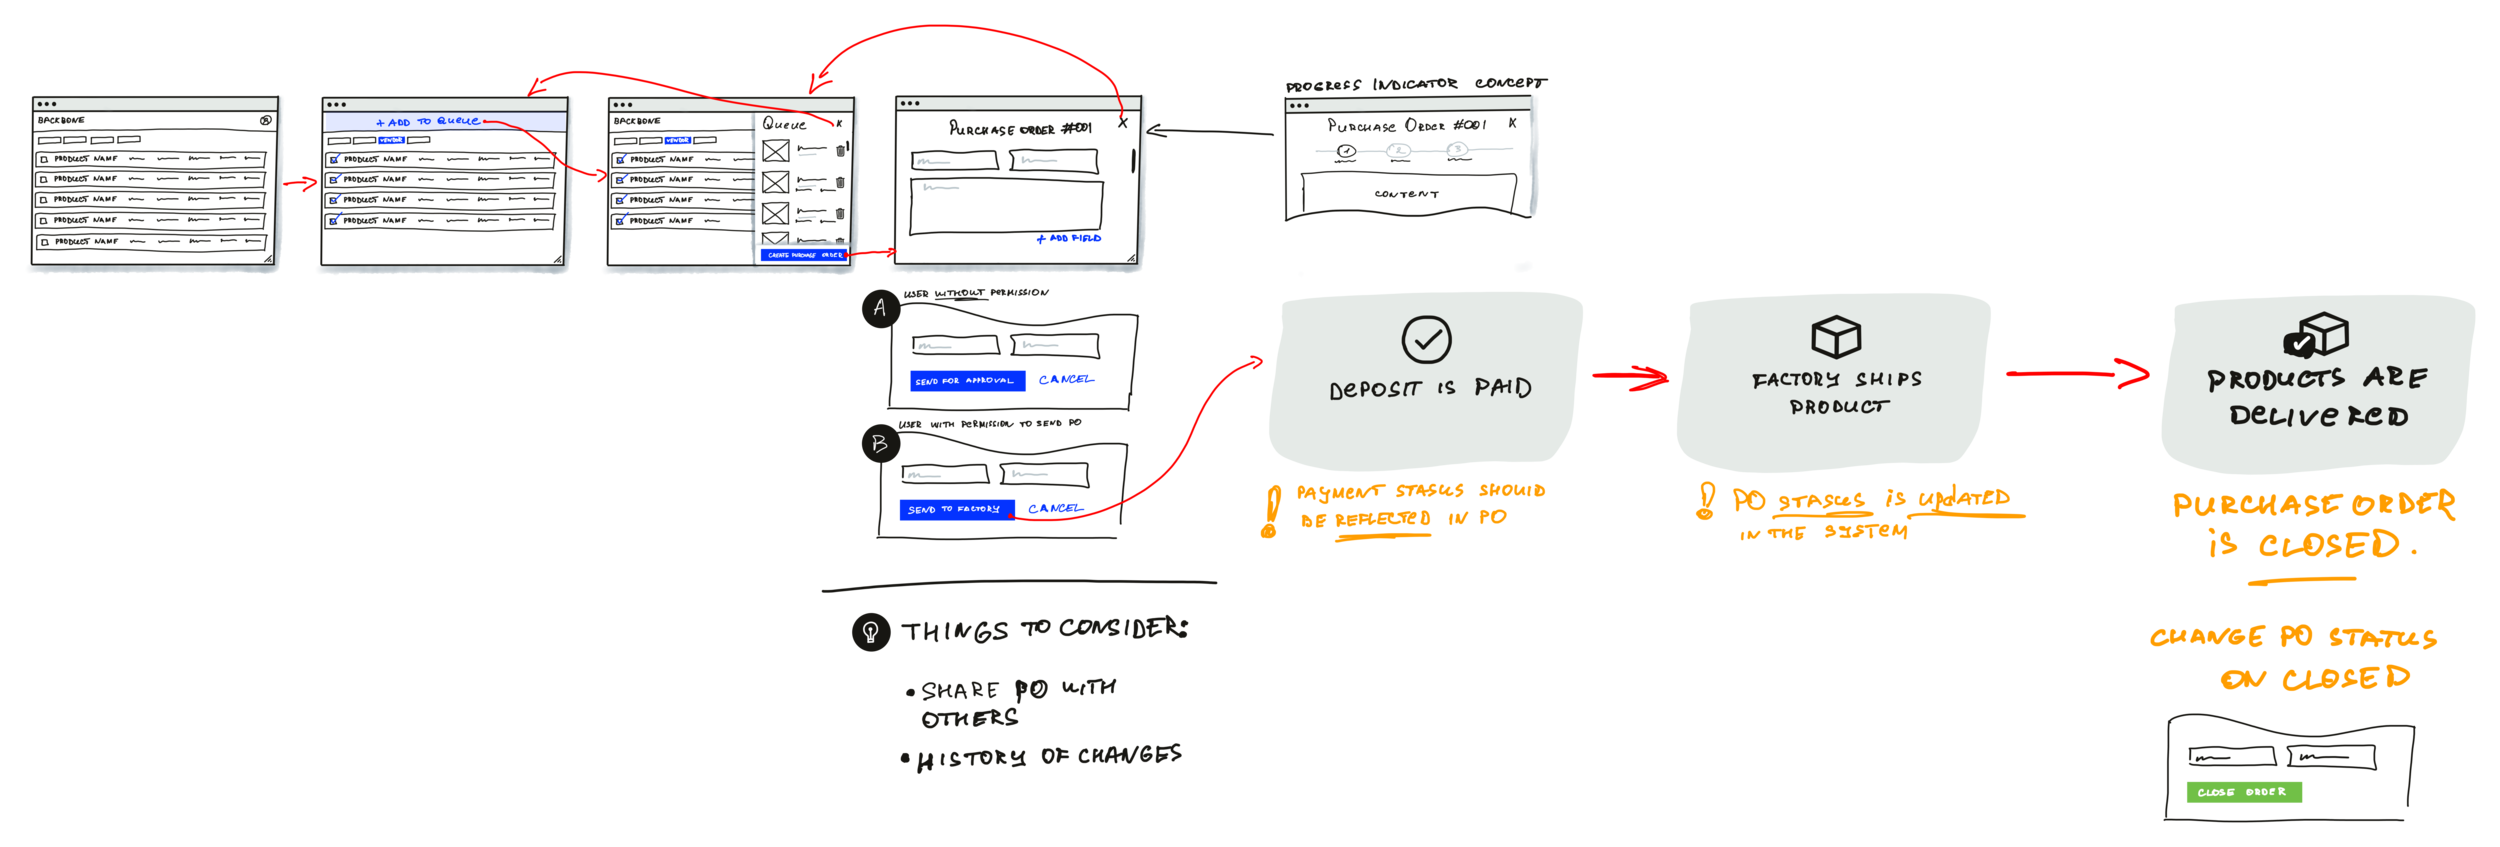 ux-sketching-wireframes-ipad.png